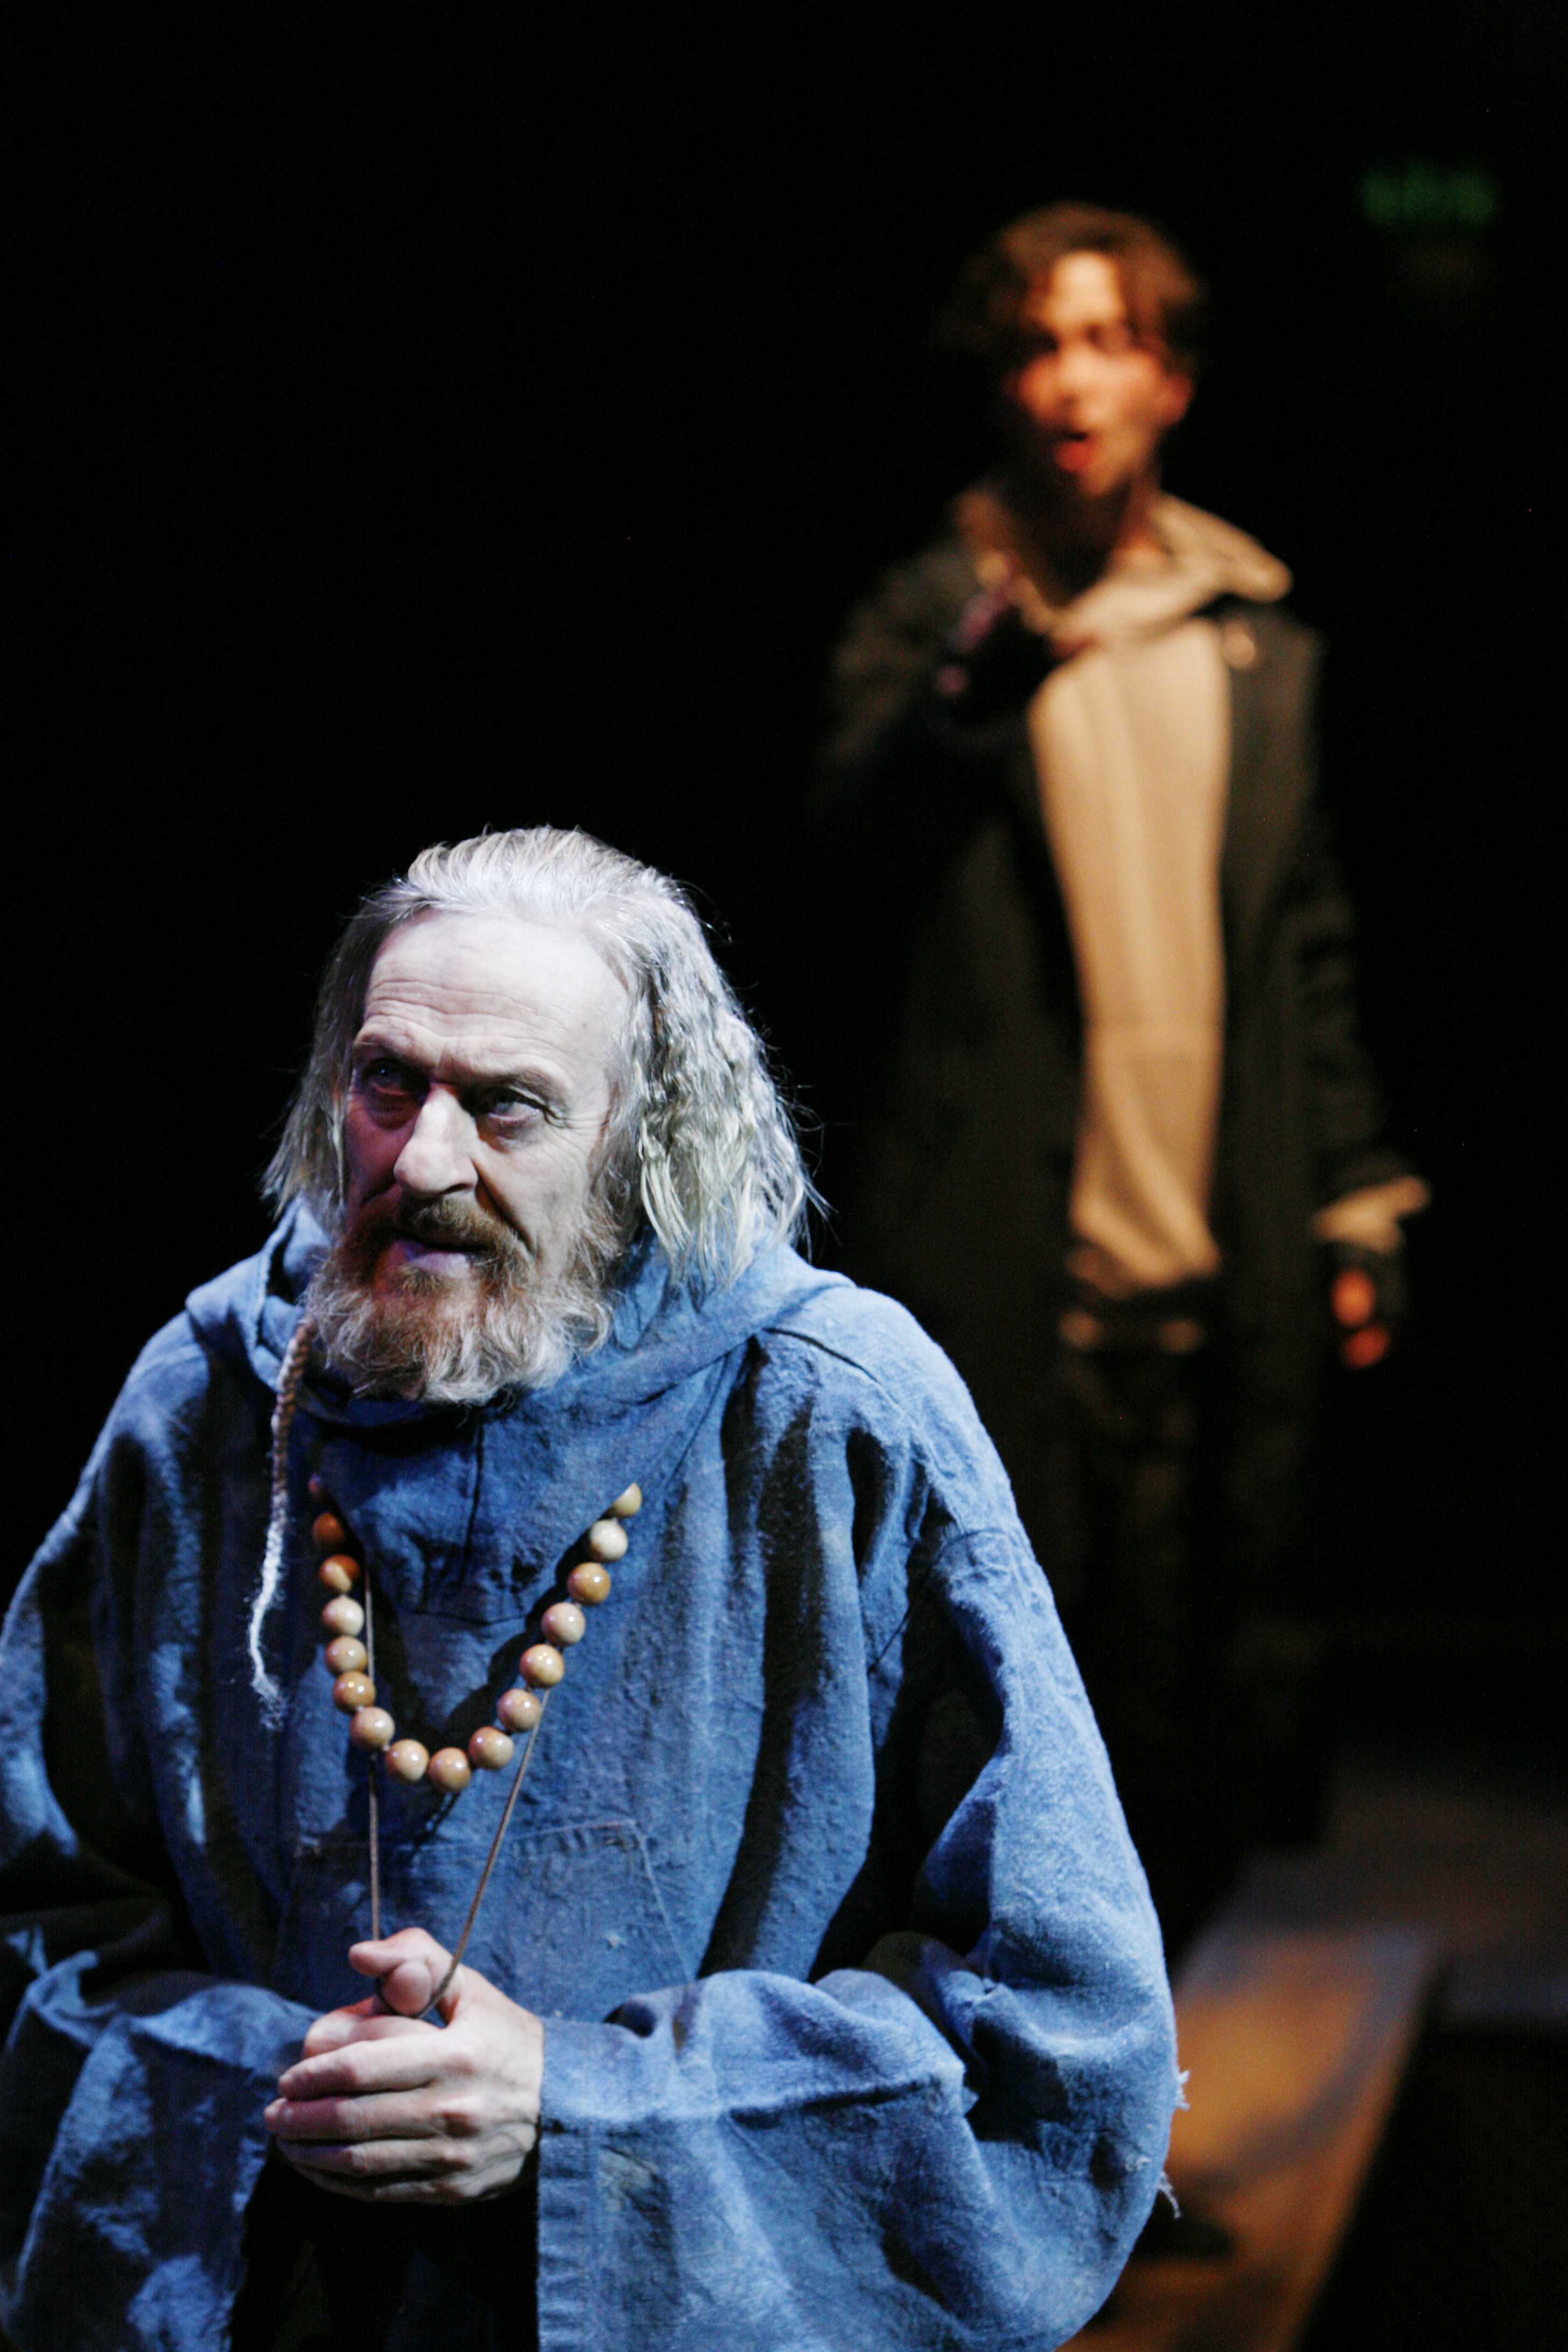 Richard Bremmer & George Caple in Romeo & Juliet, photo by Gary Calton GC270517034